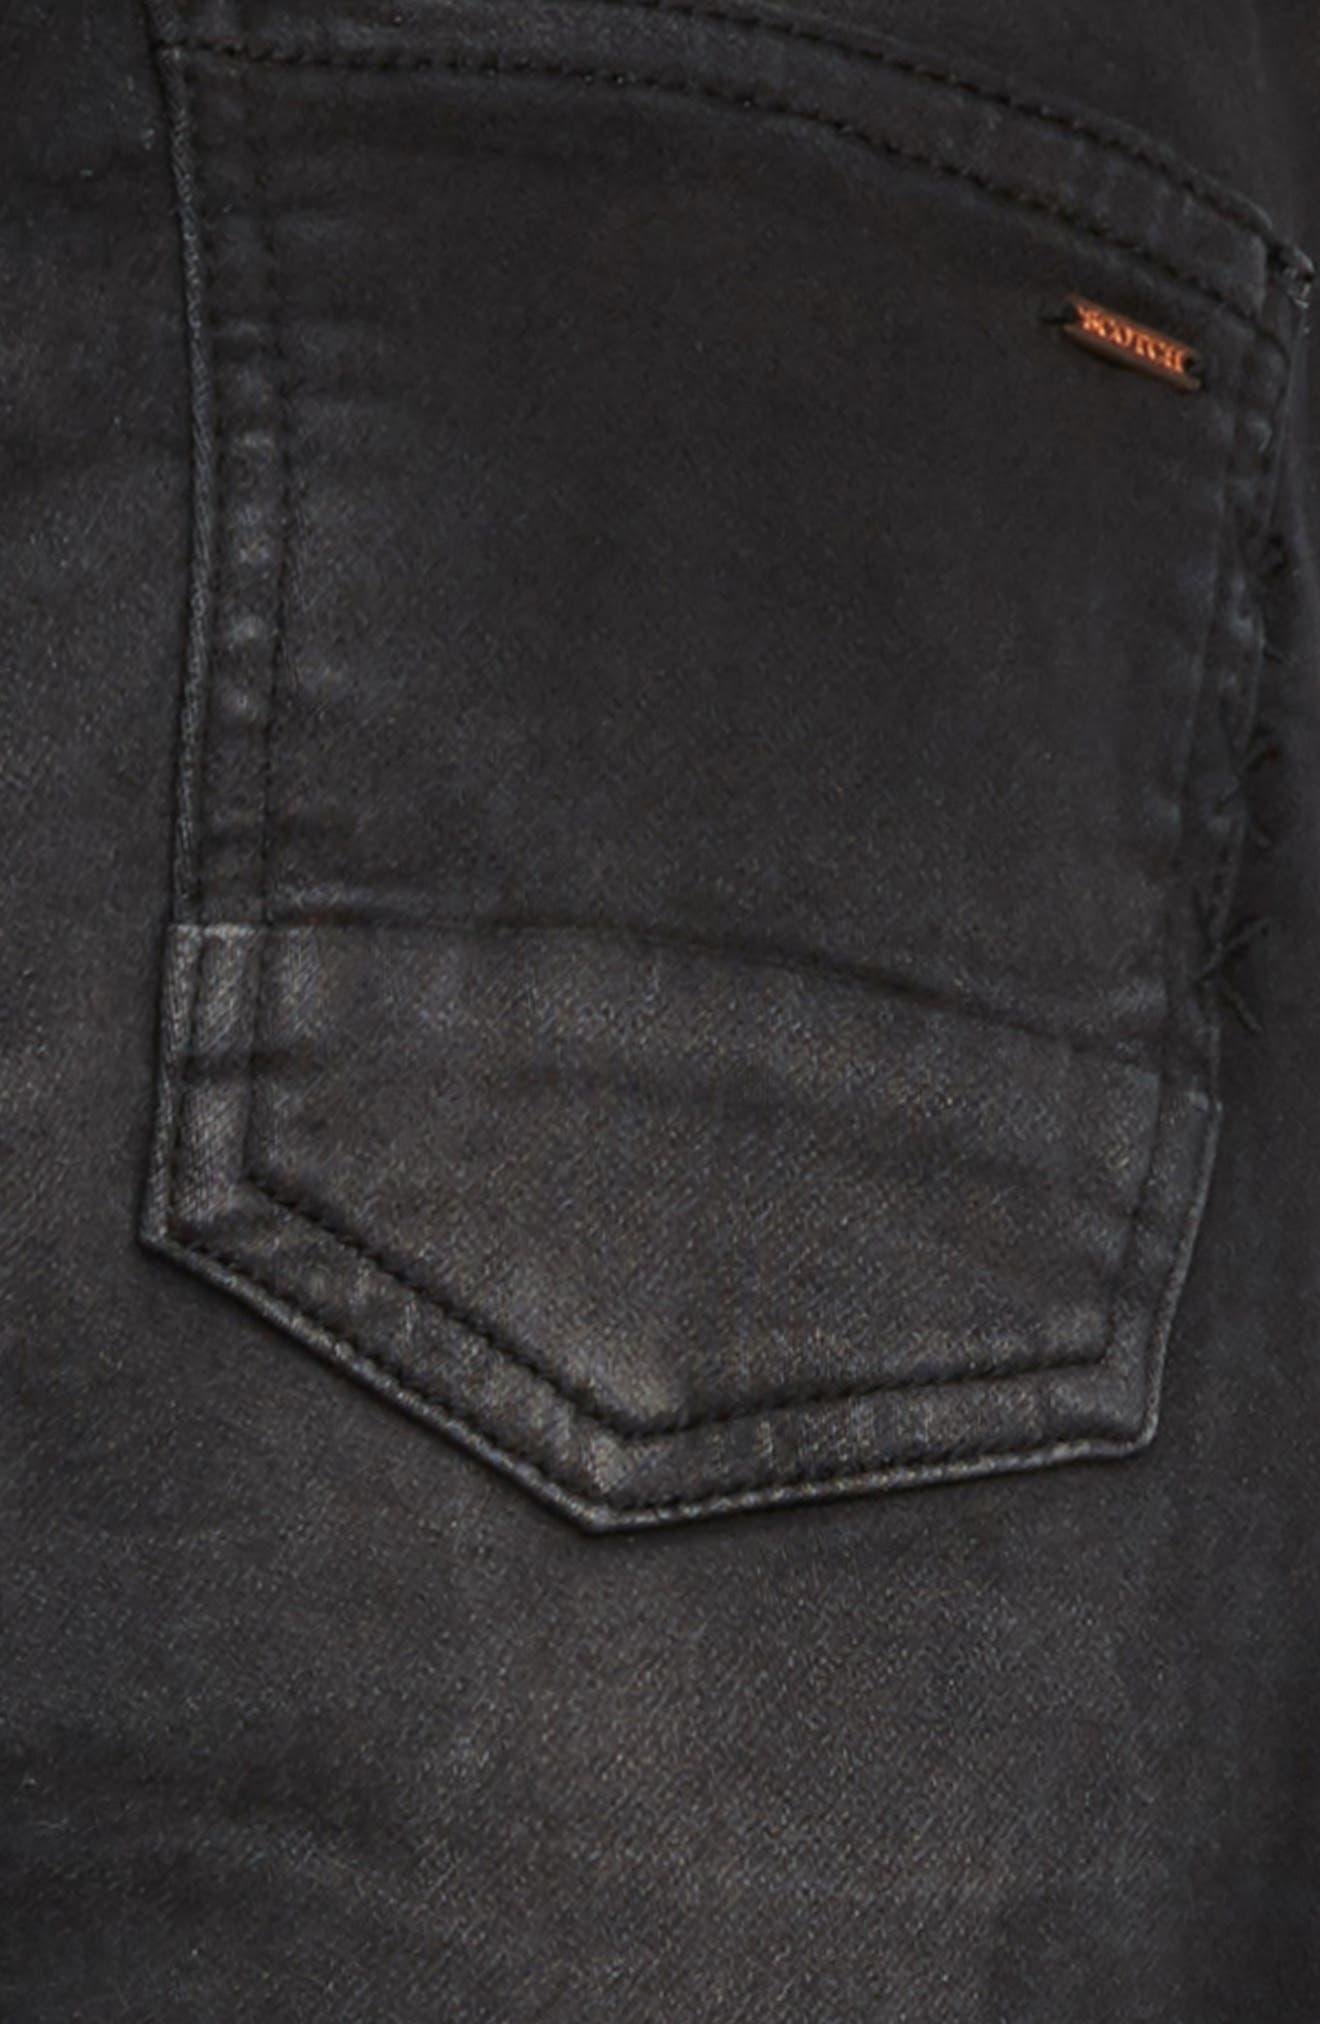 Slim Pull-On Pants,                             Alternate thumbnail 3, color,                             001